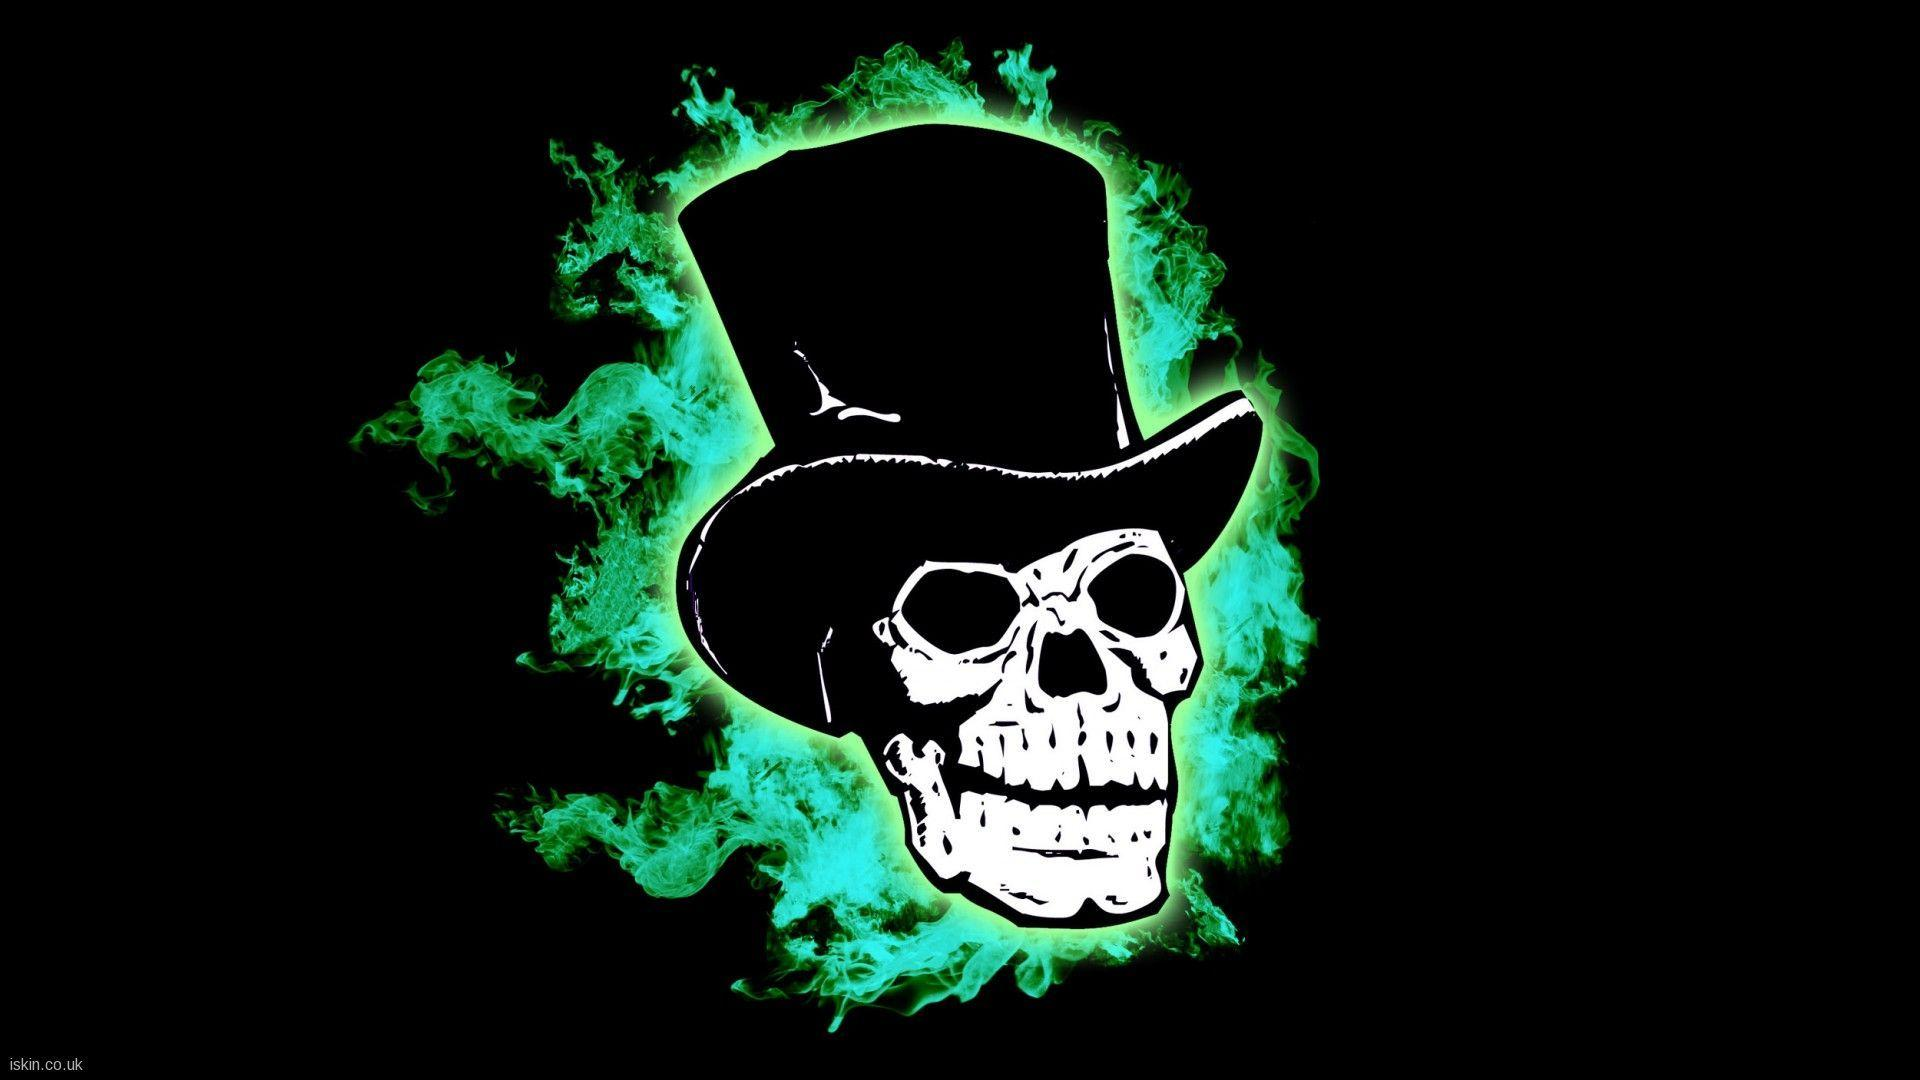 zombie skull wallpapers for desktop - photo #6